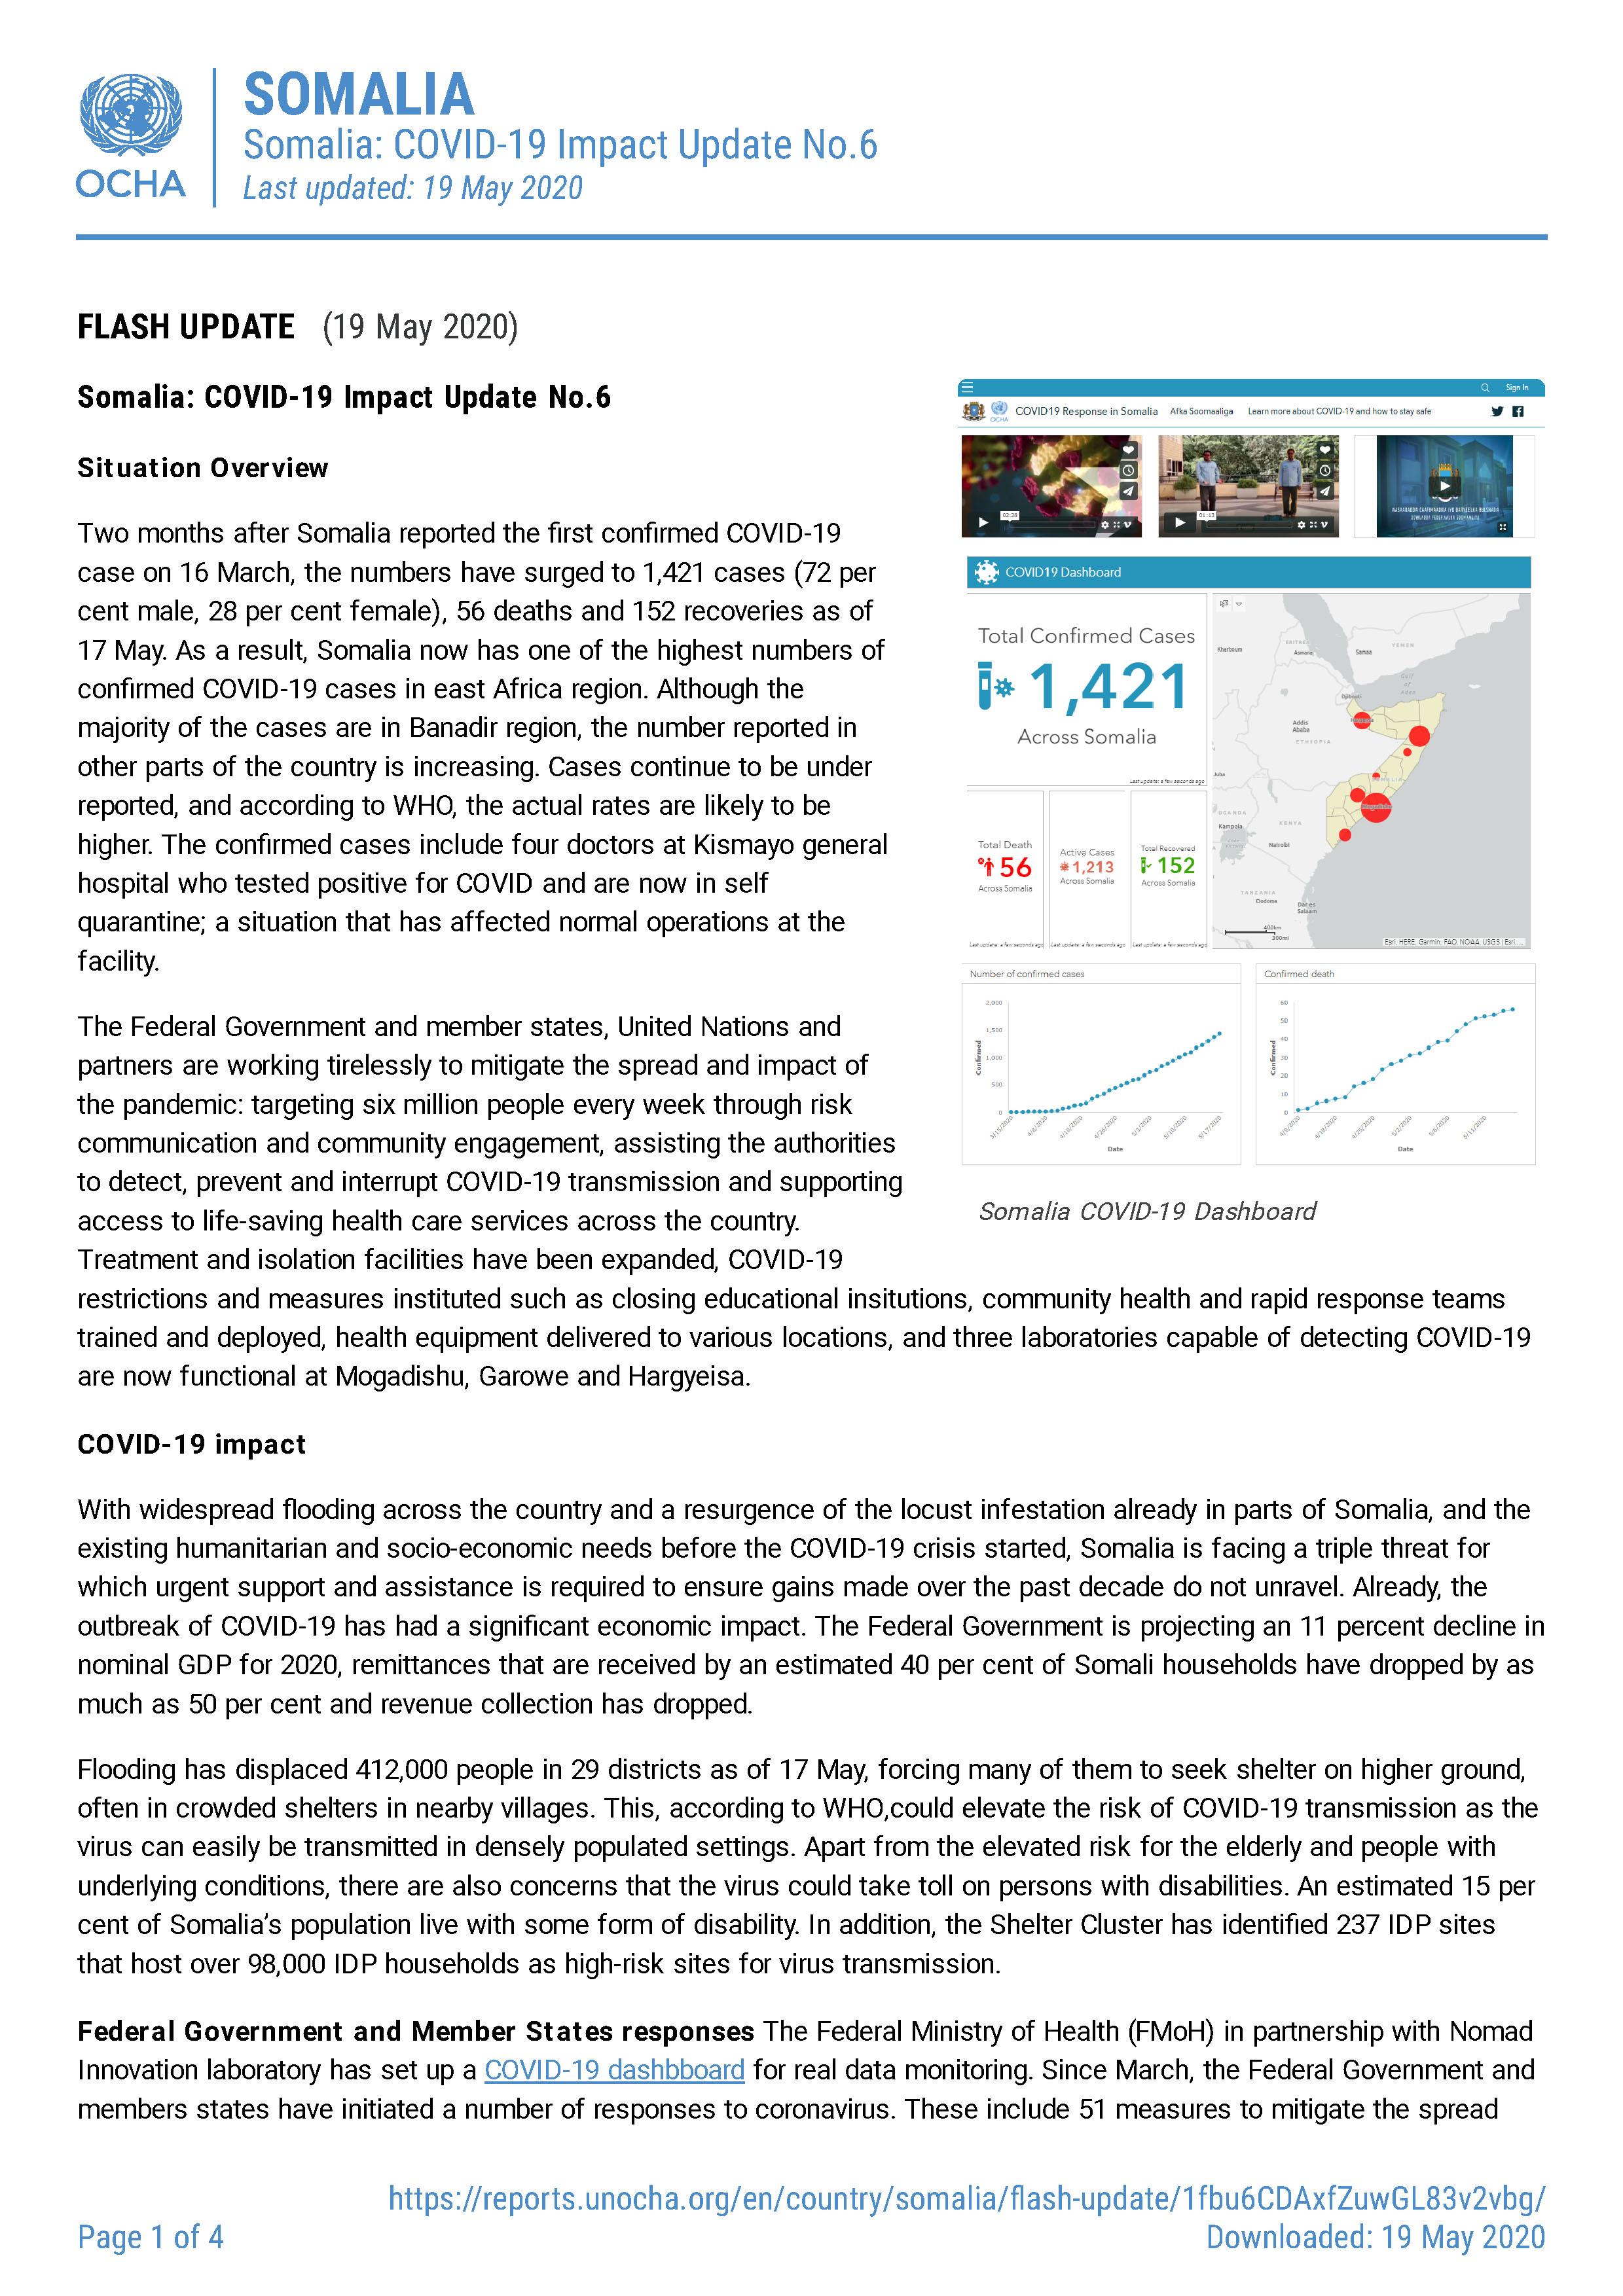 Somalia: COVID-19 Impact Update No. 6 (As of 19 May 2020)